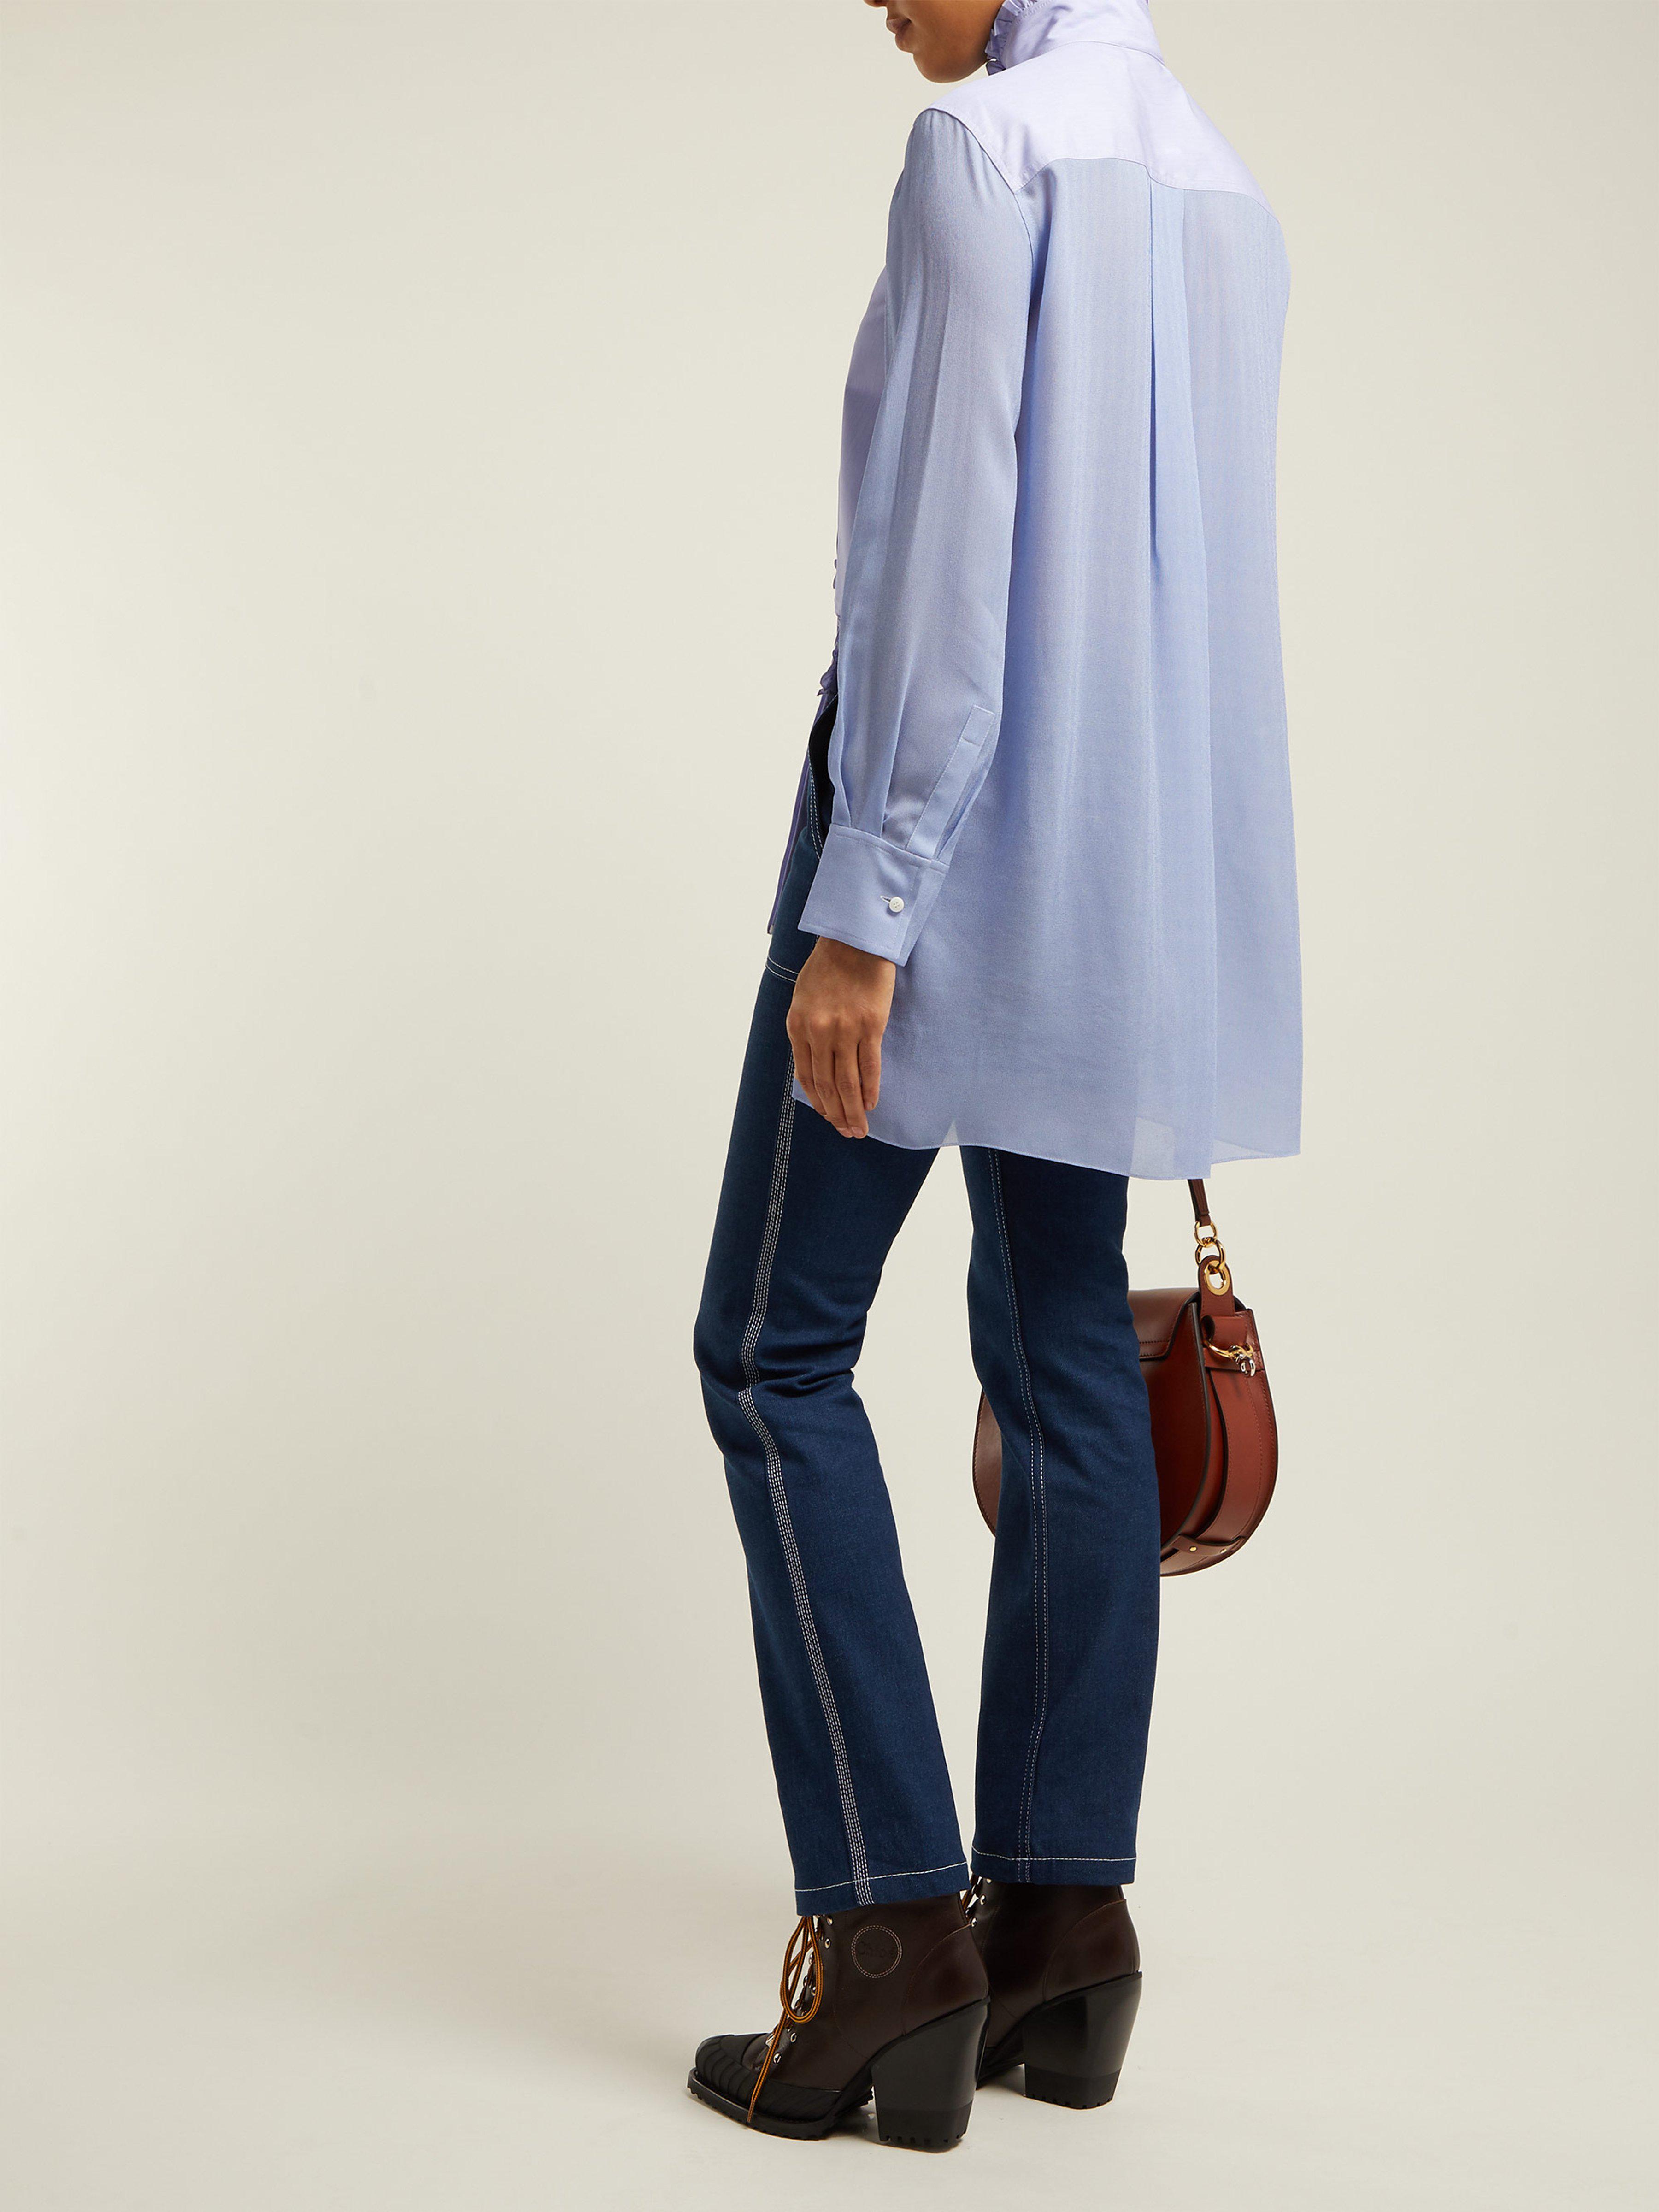 c302e242543ca Chloé Ruffle Trim Cotton Shirt in Blue - Lyst